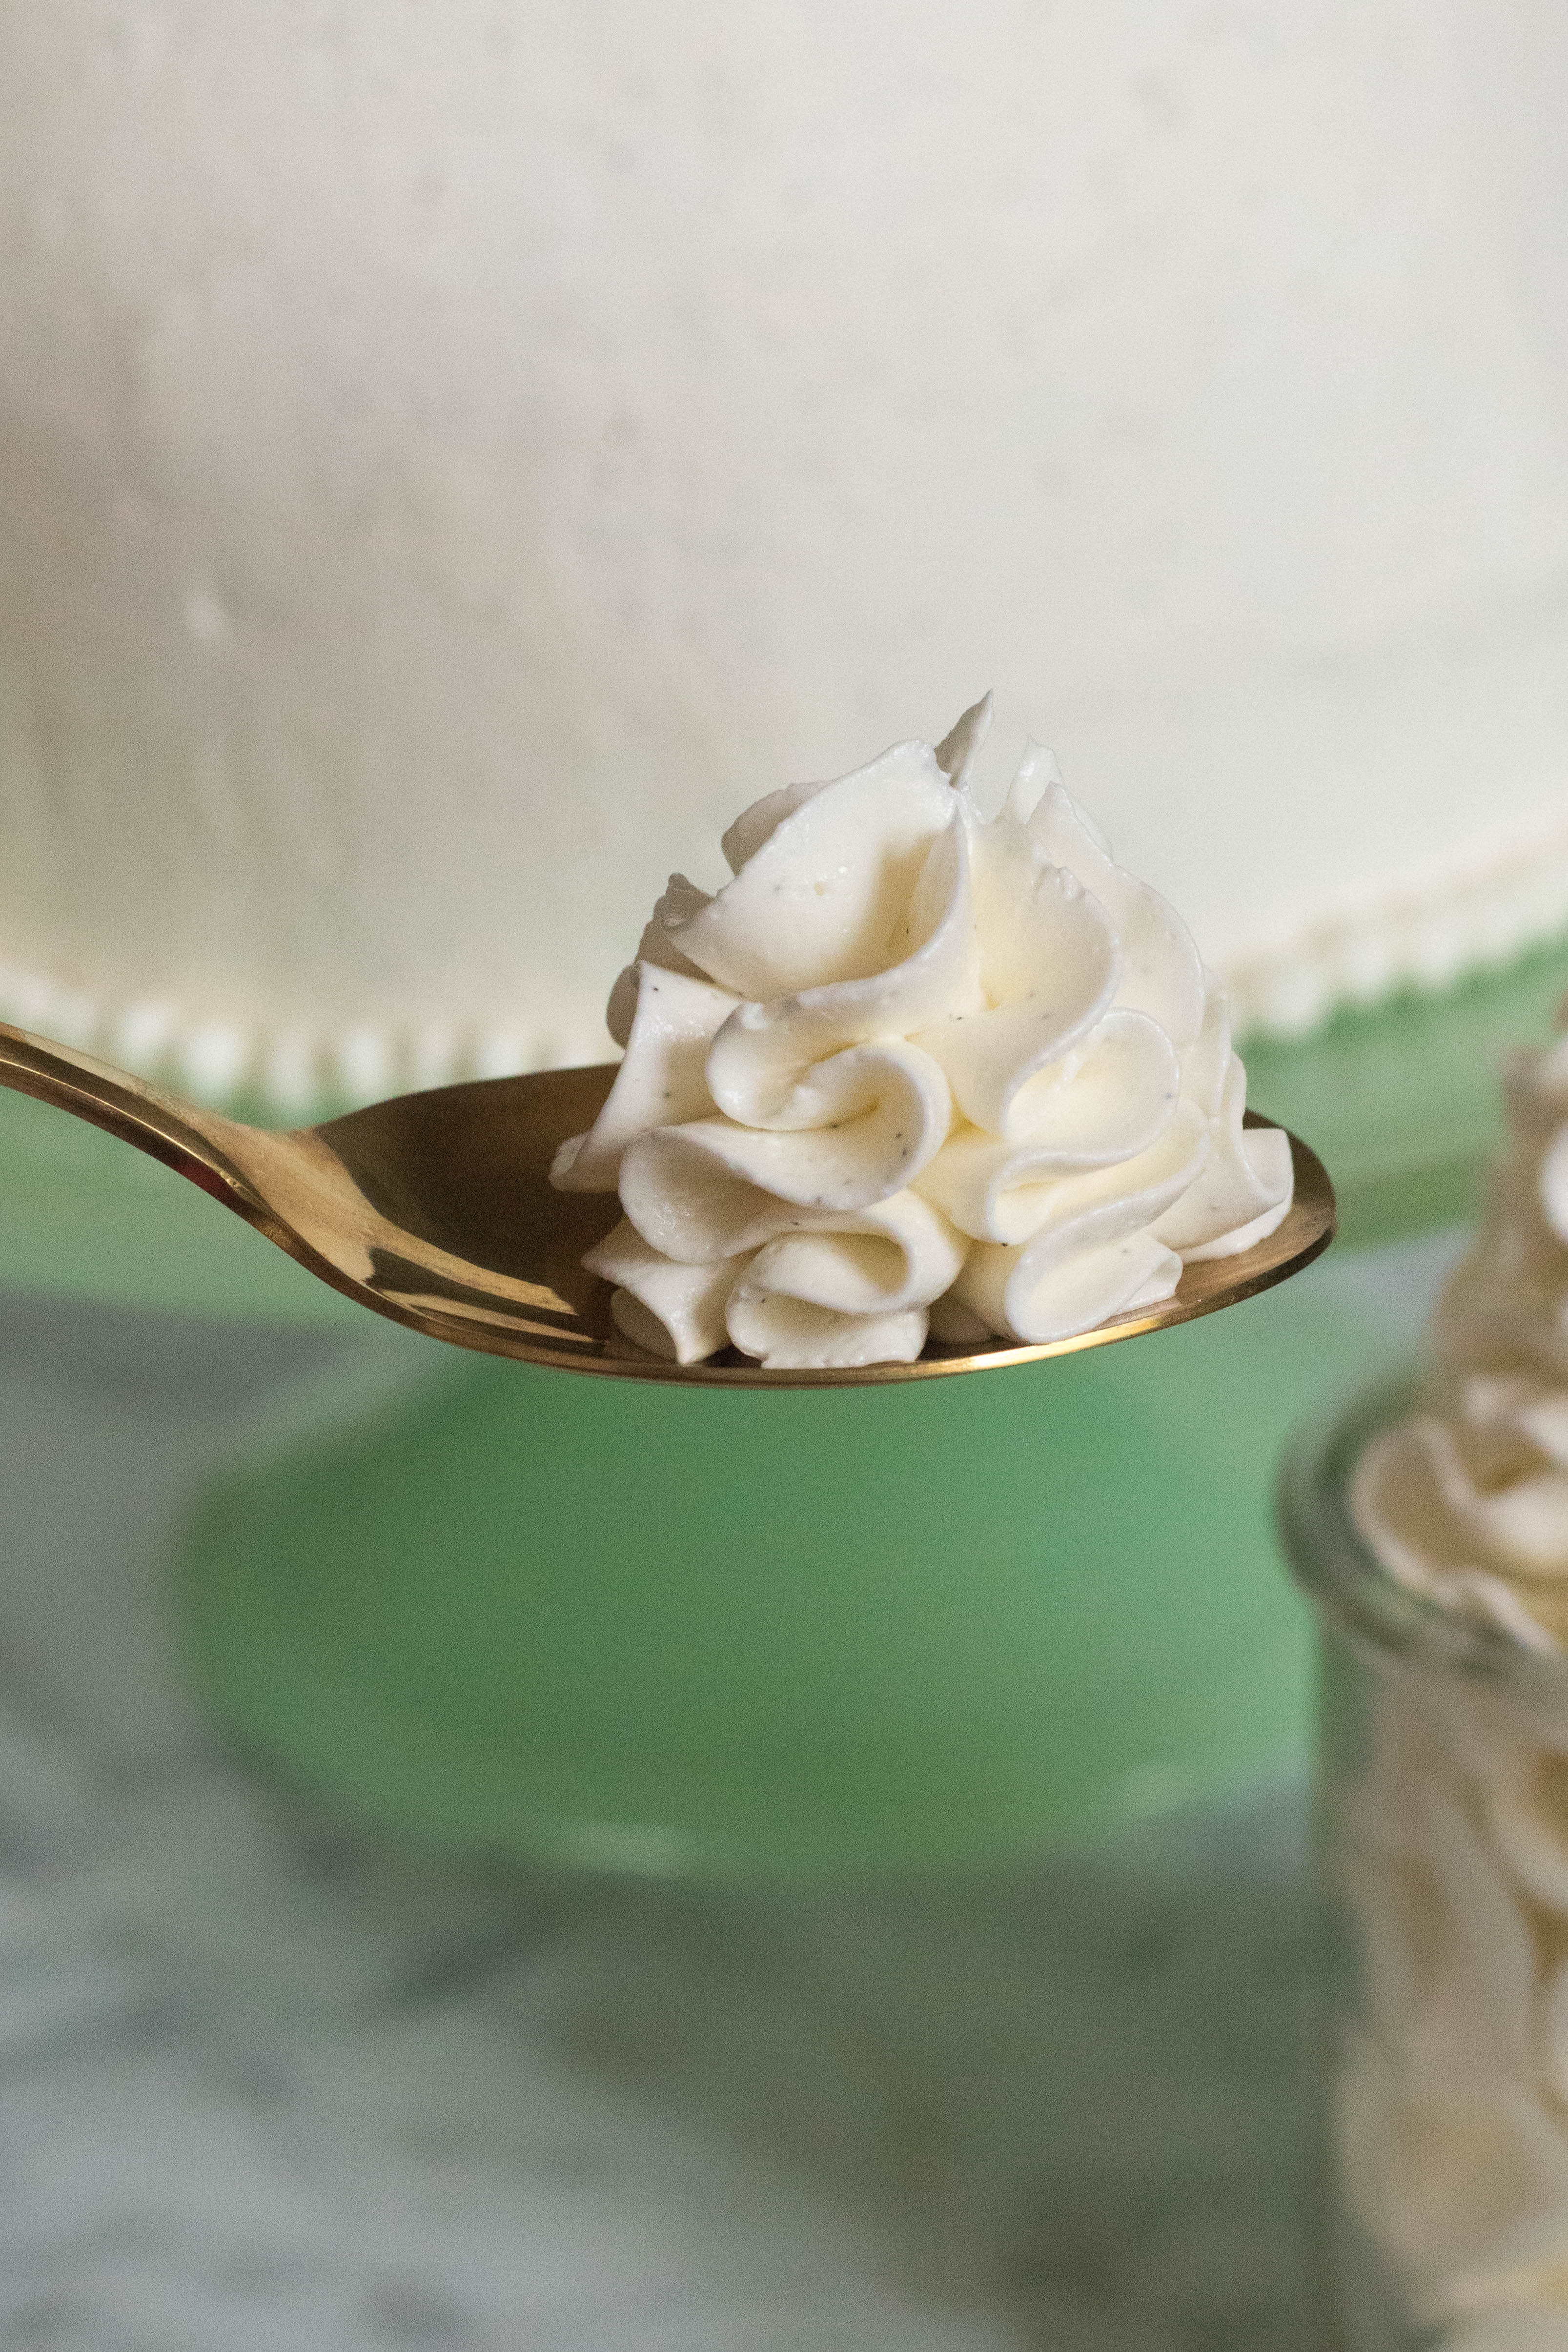 Italian buttercream recipes